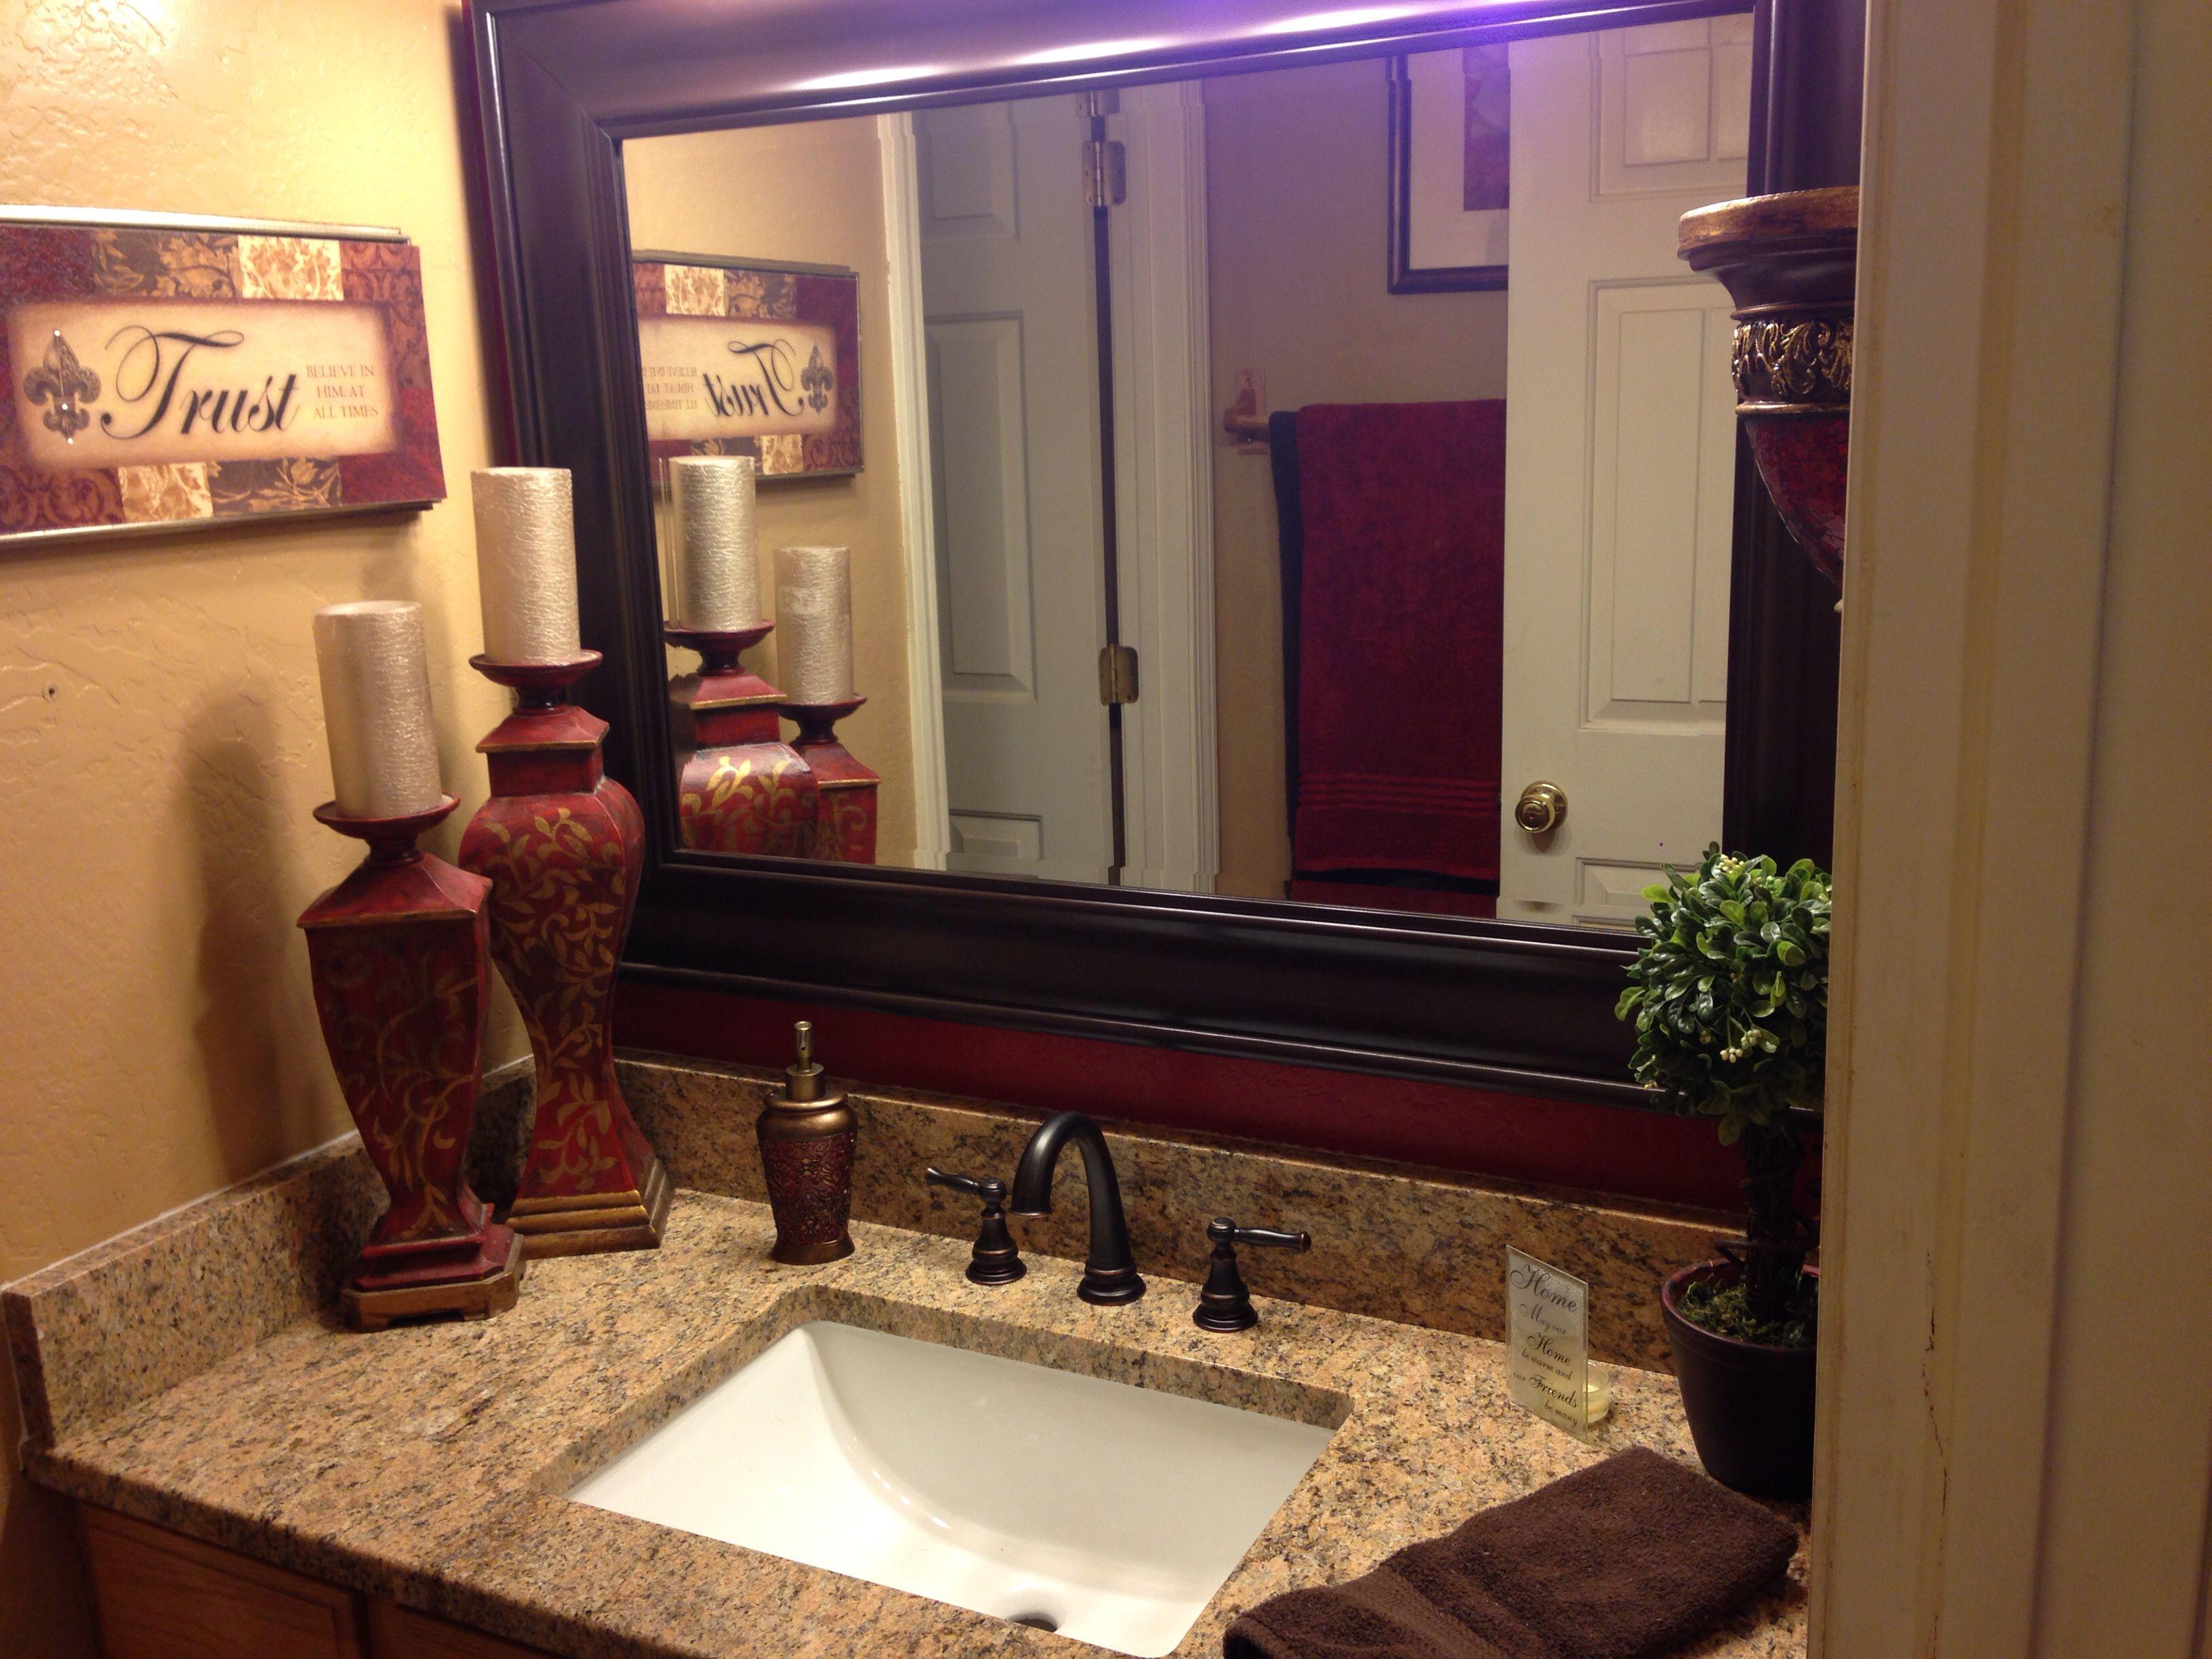 Tan & Red Bathroom Remodel Bellagio Sand Granite Counter Tops